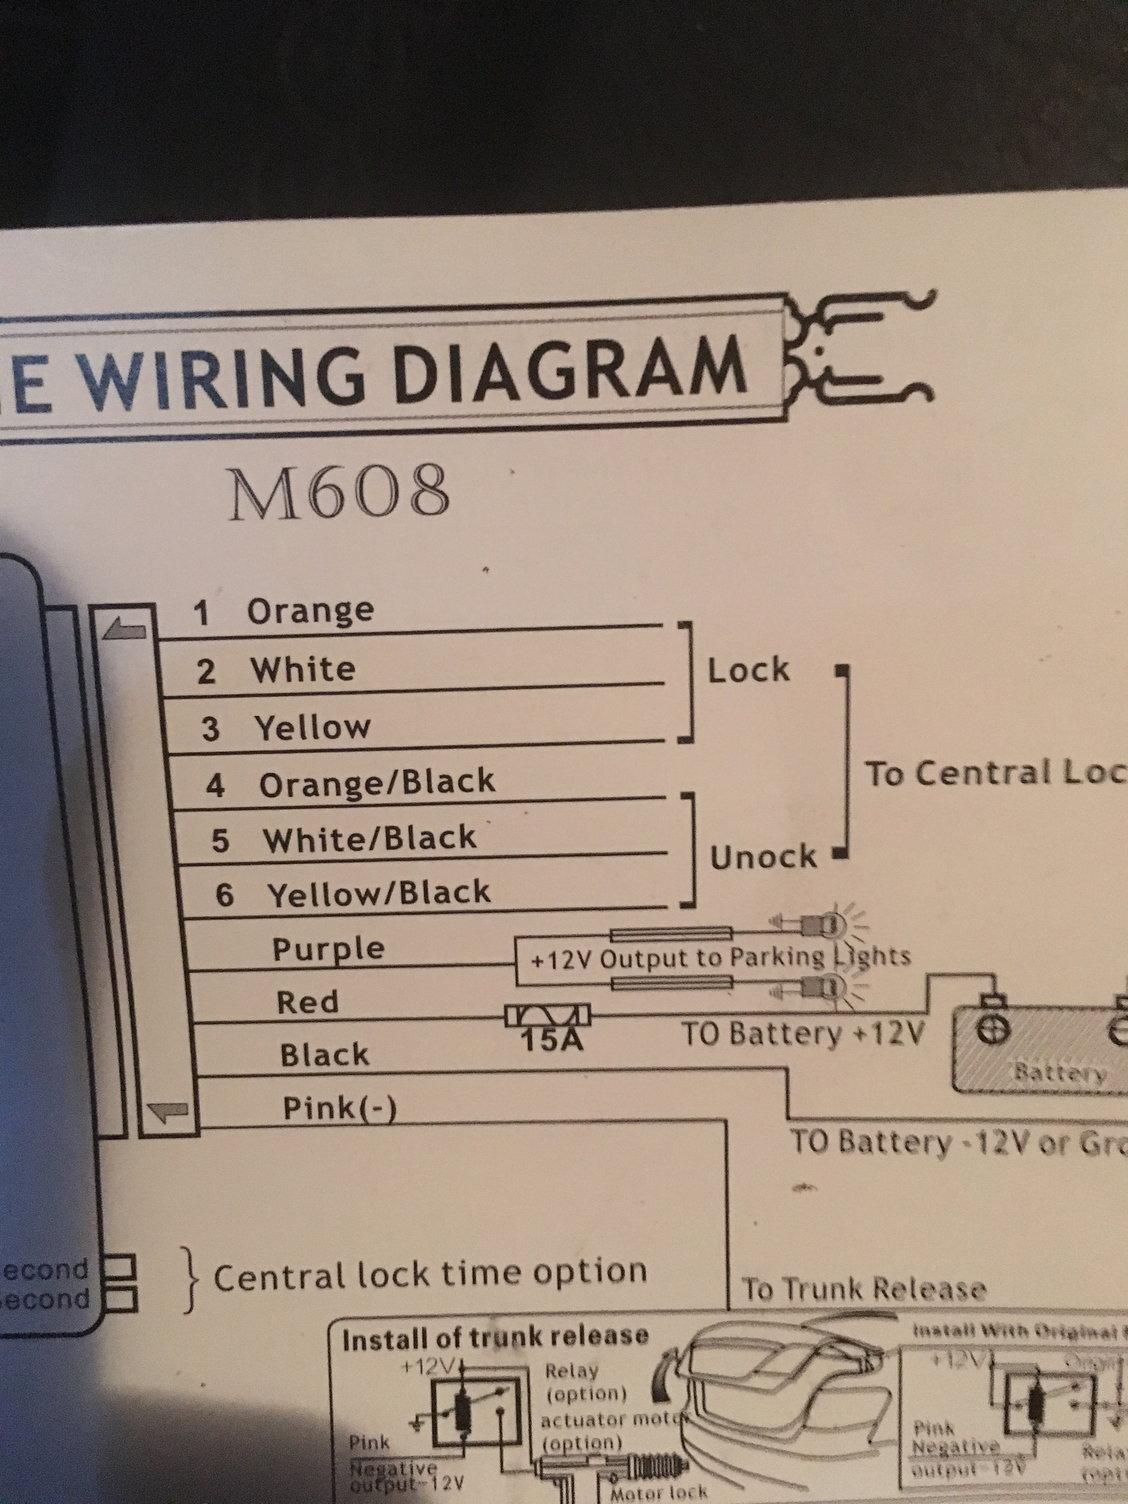 hight resolution of remote entry wiring diagram wiring diagram technic mfk 285 keyless entry system wiring diagram keyless entry wiring diagram